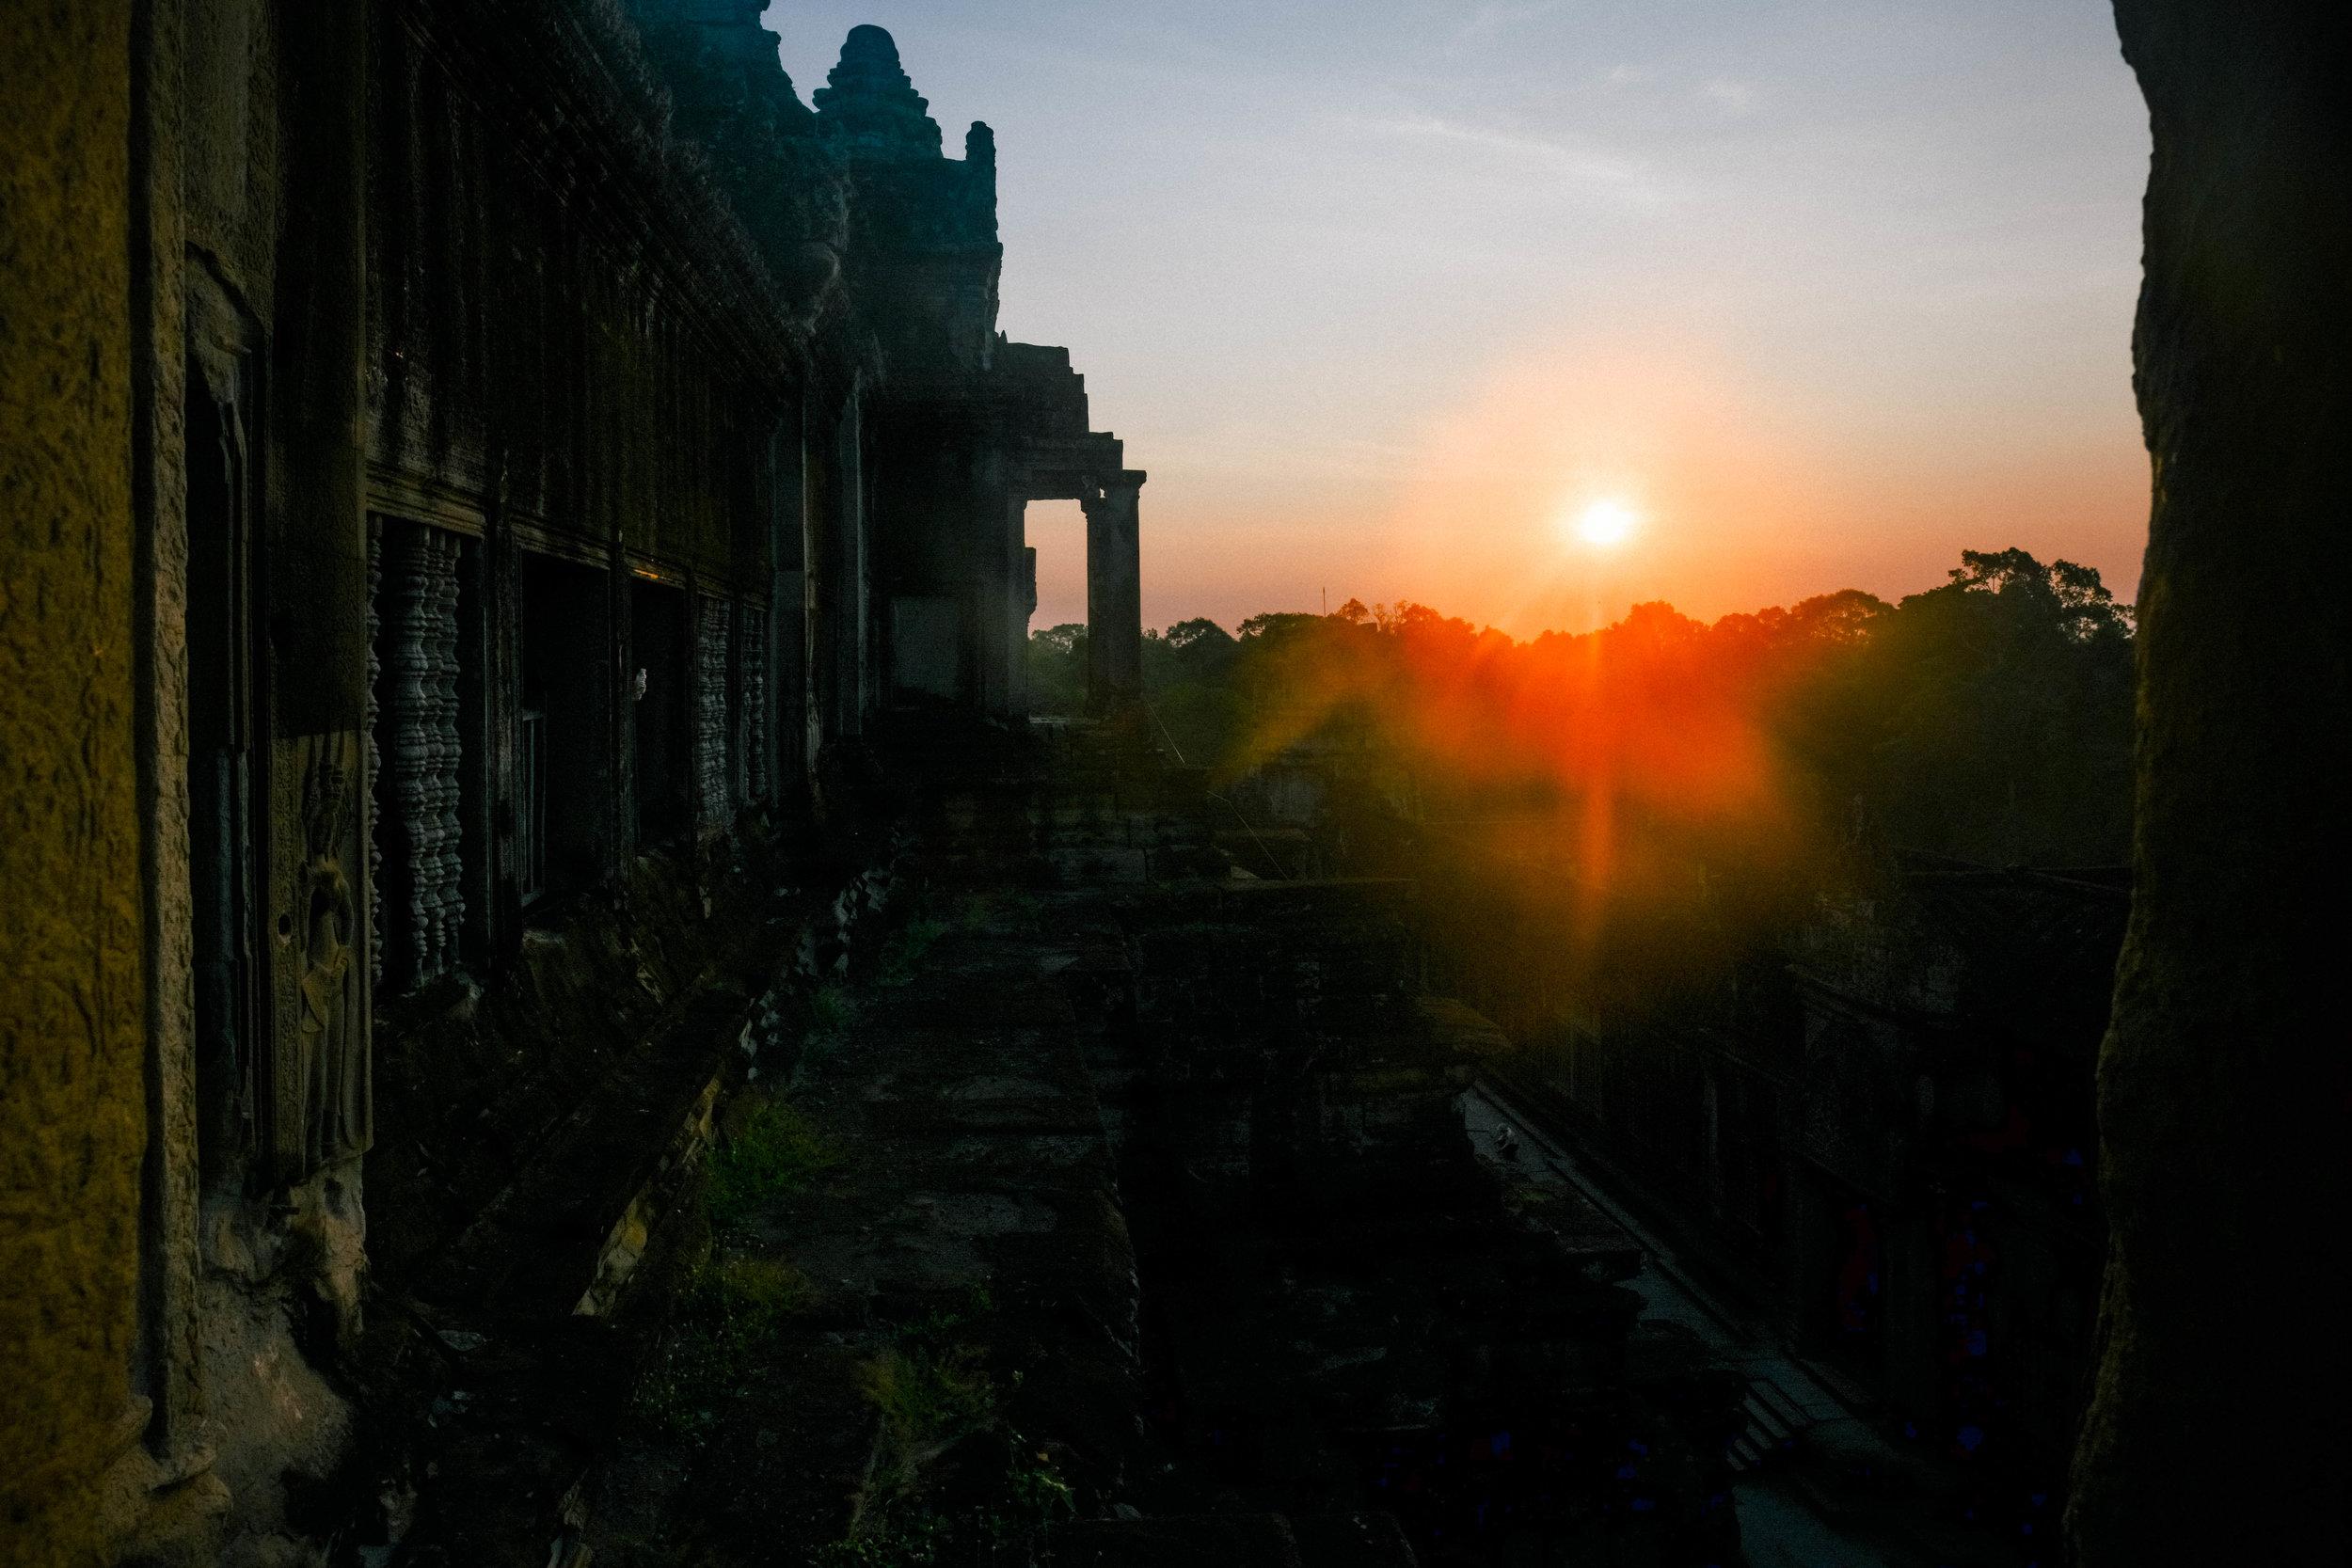 sunrise buildings